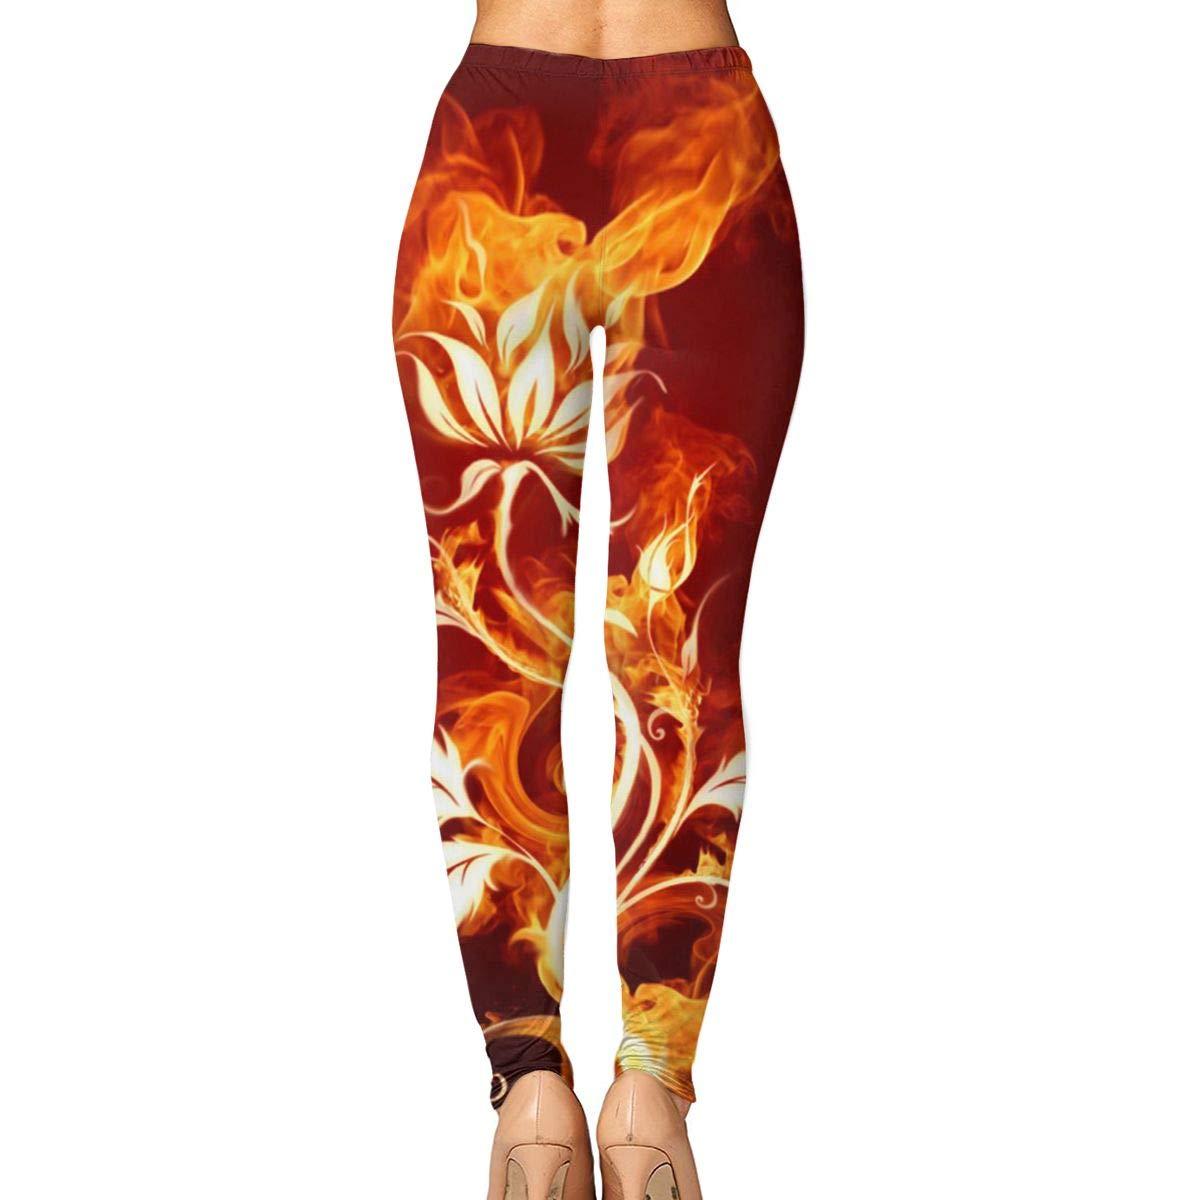 55104361763c8e Amazon.com: GoldK Women's Flame Rose Yoga Pants Capri Leggings High Waist  Tights Skinny Pants: Clothing